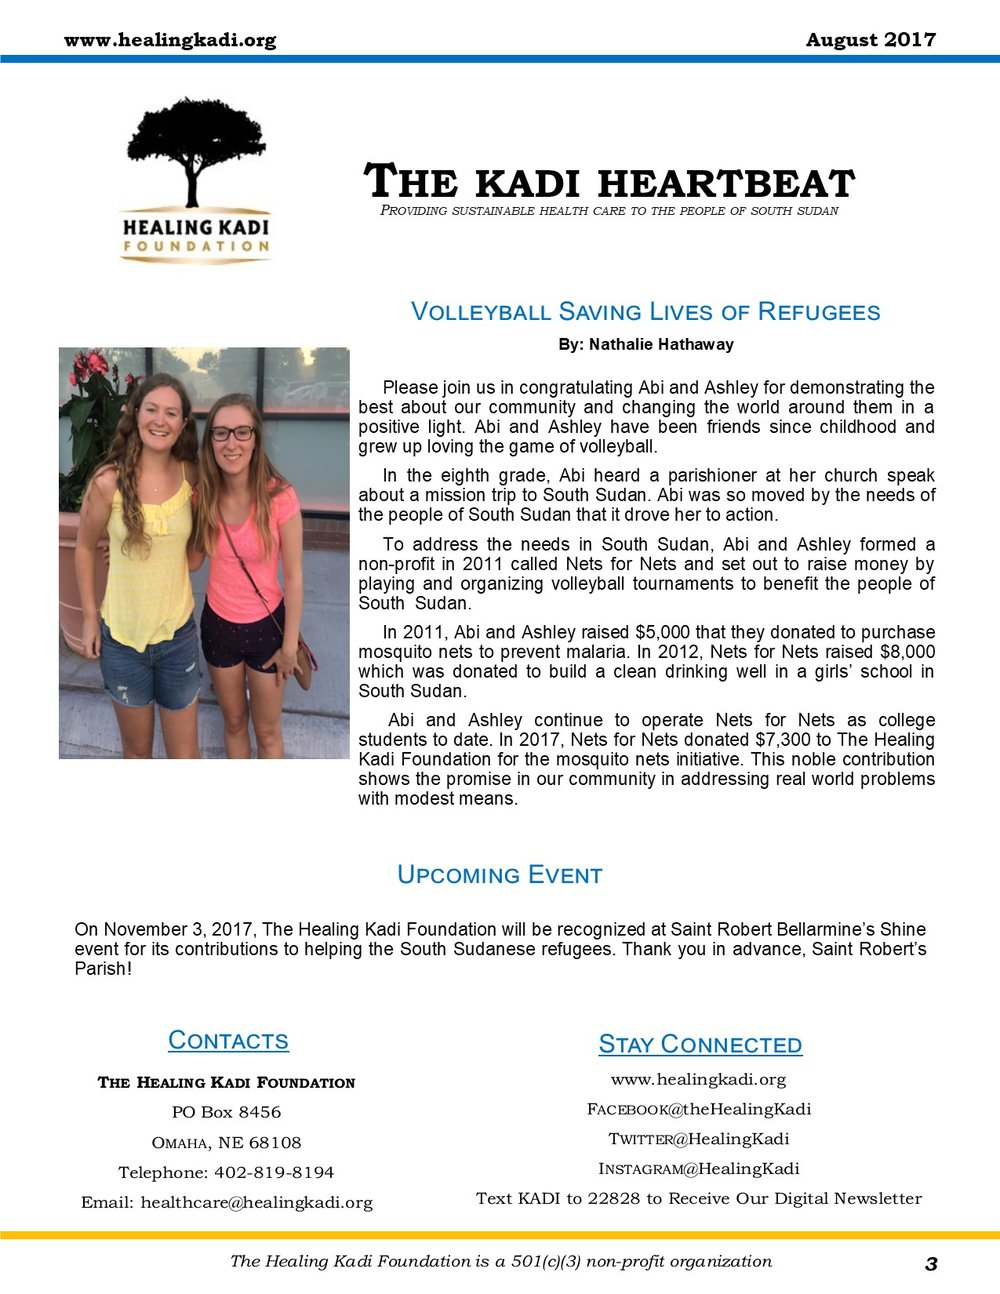 The Kadi Beat_August_6_2017-p3.jpg